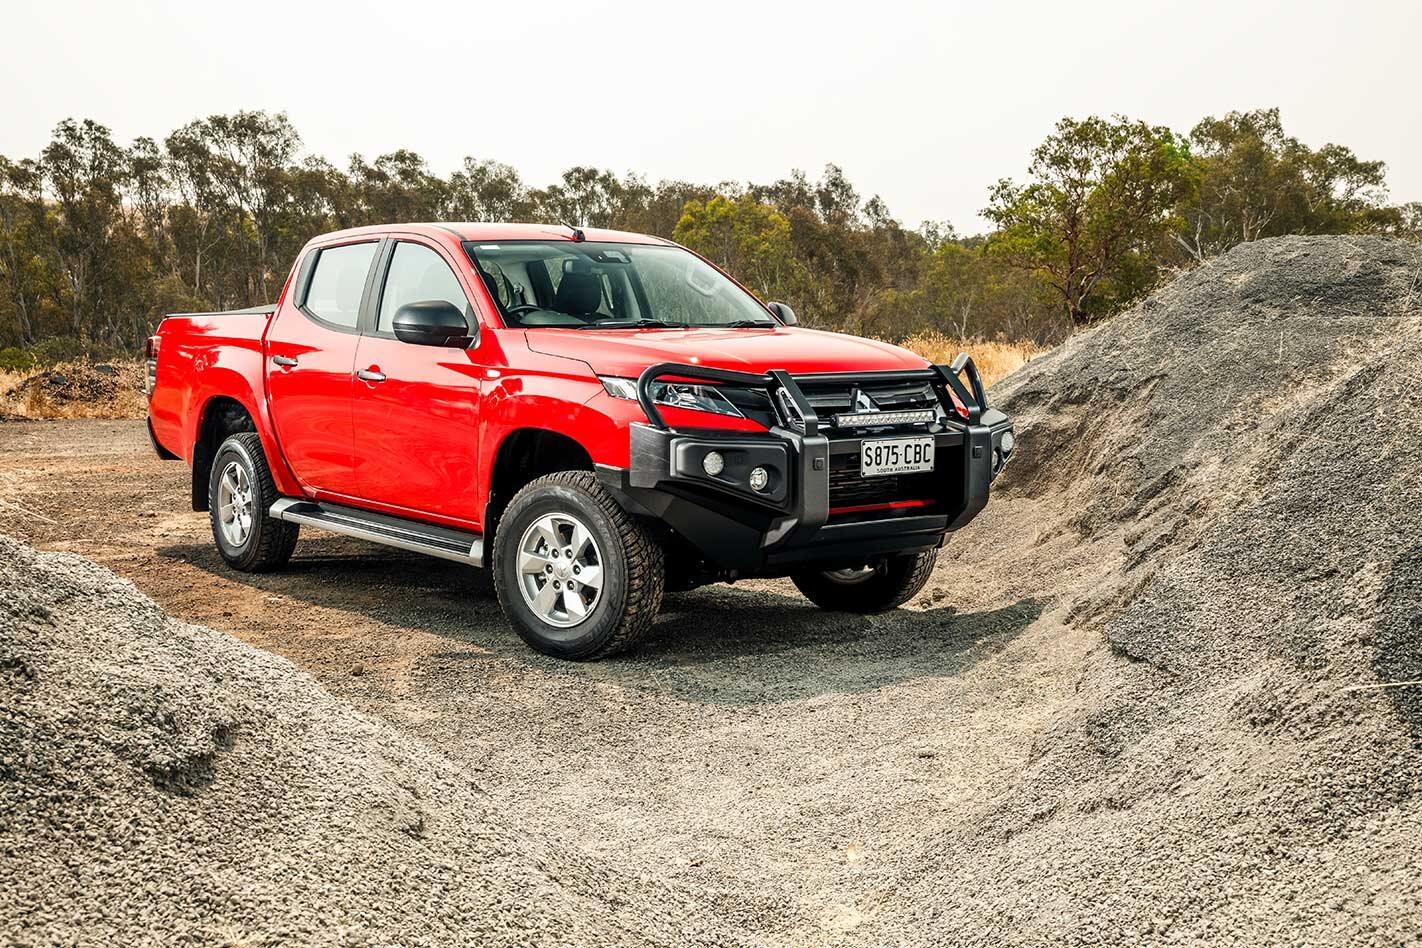 Mitsubishi Triton GLX long-term review